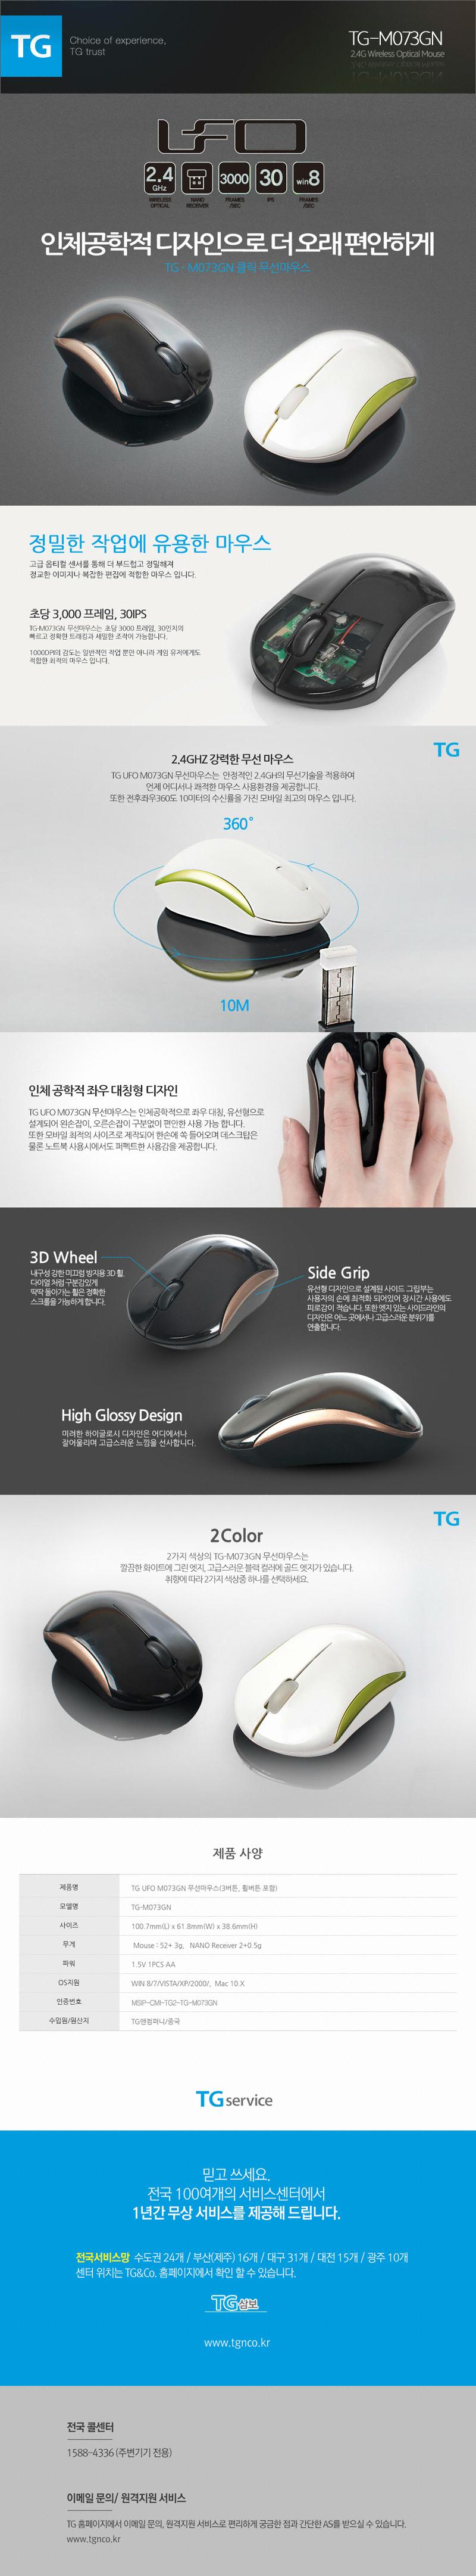 TG_073GN_0921.jpg